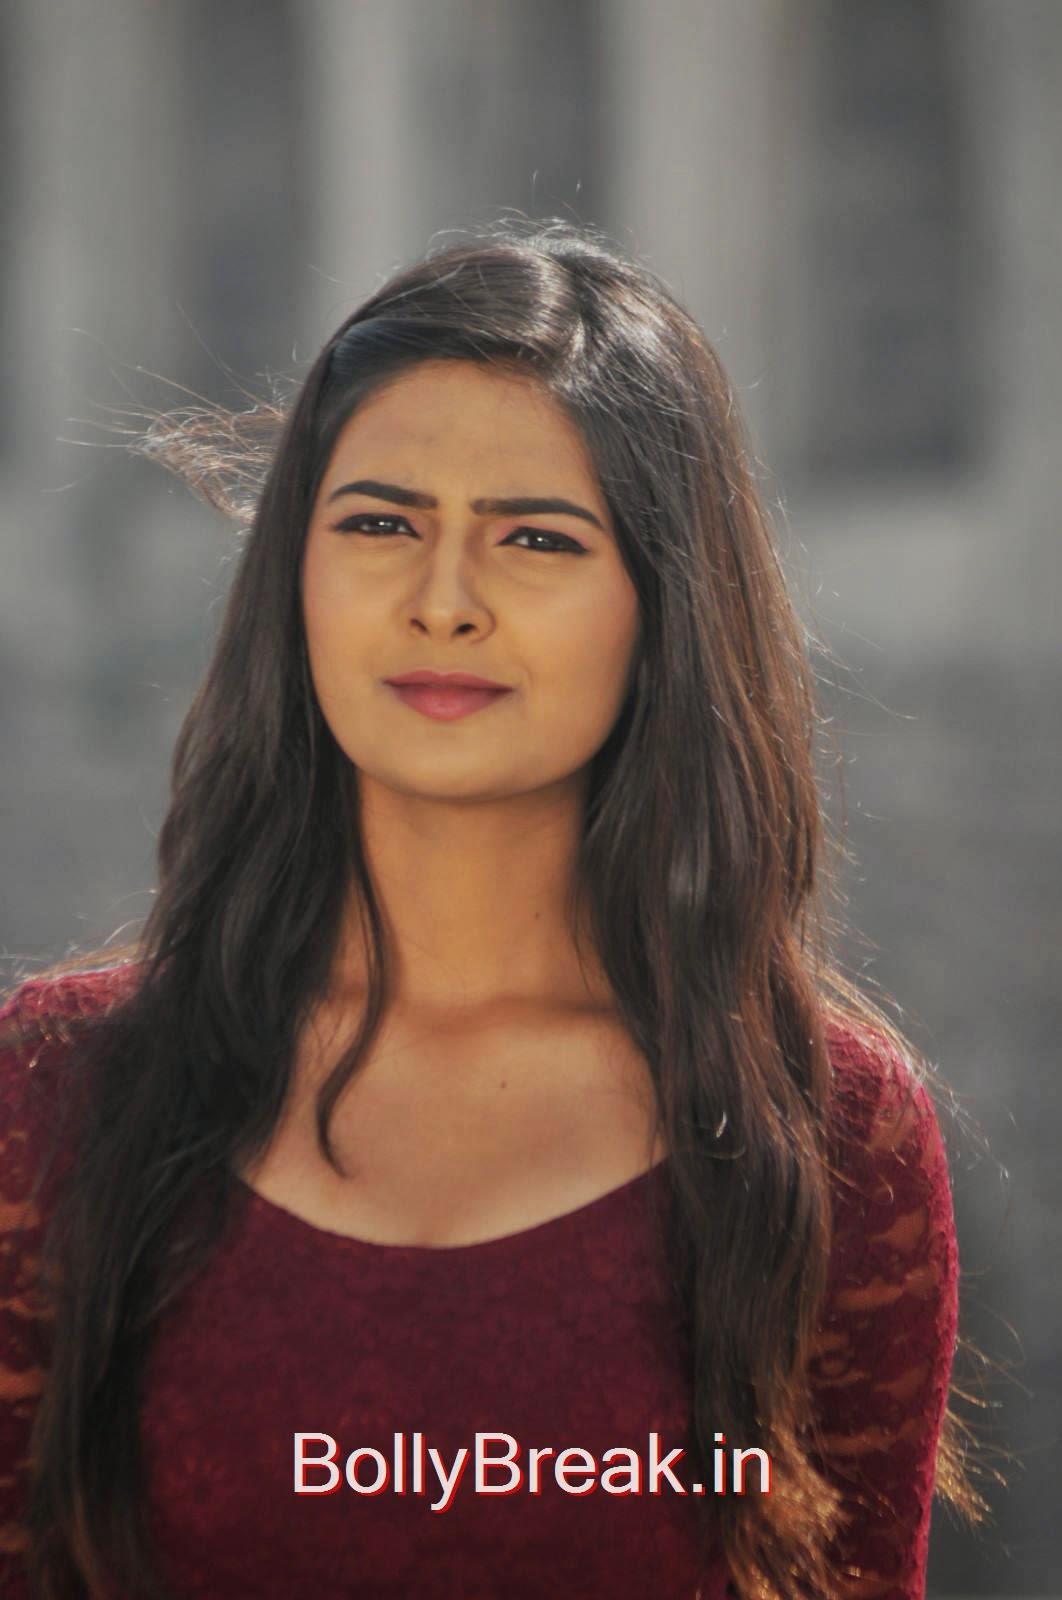 Neha Deshpande images, Actress Neha Deshpande Hot HD Stills from The Bells Movie